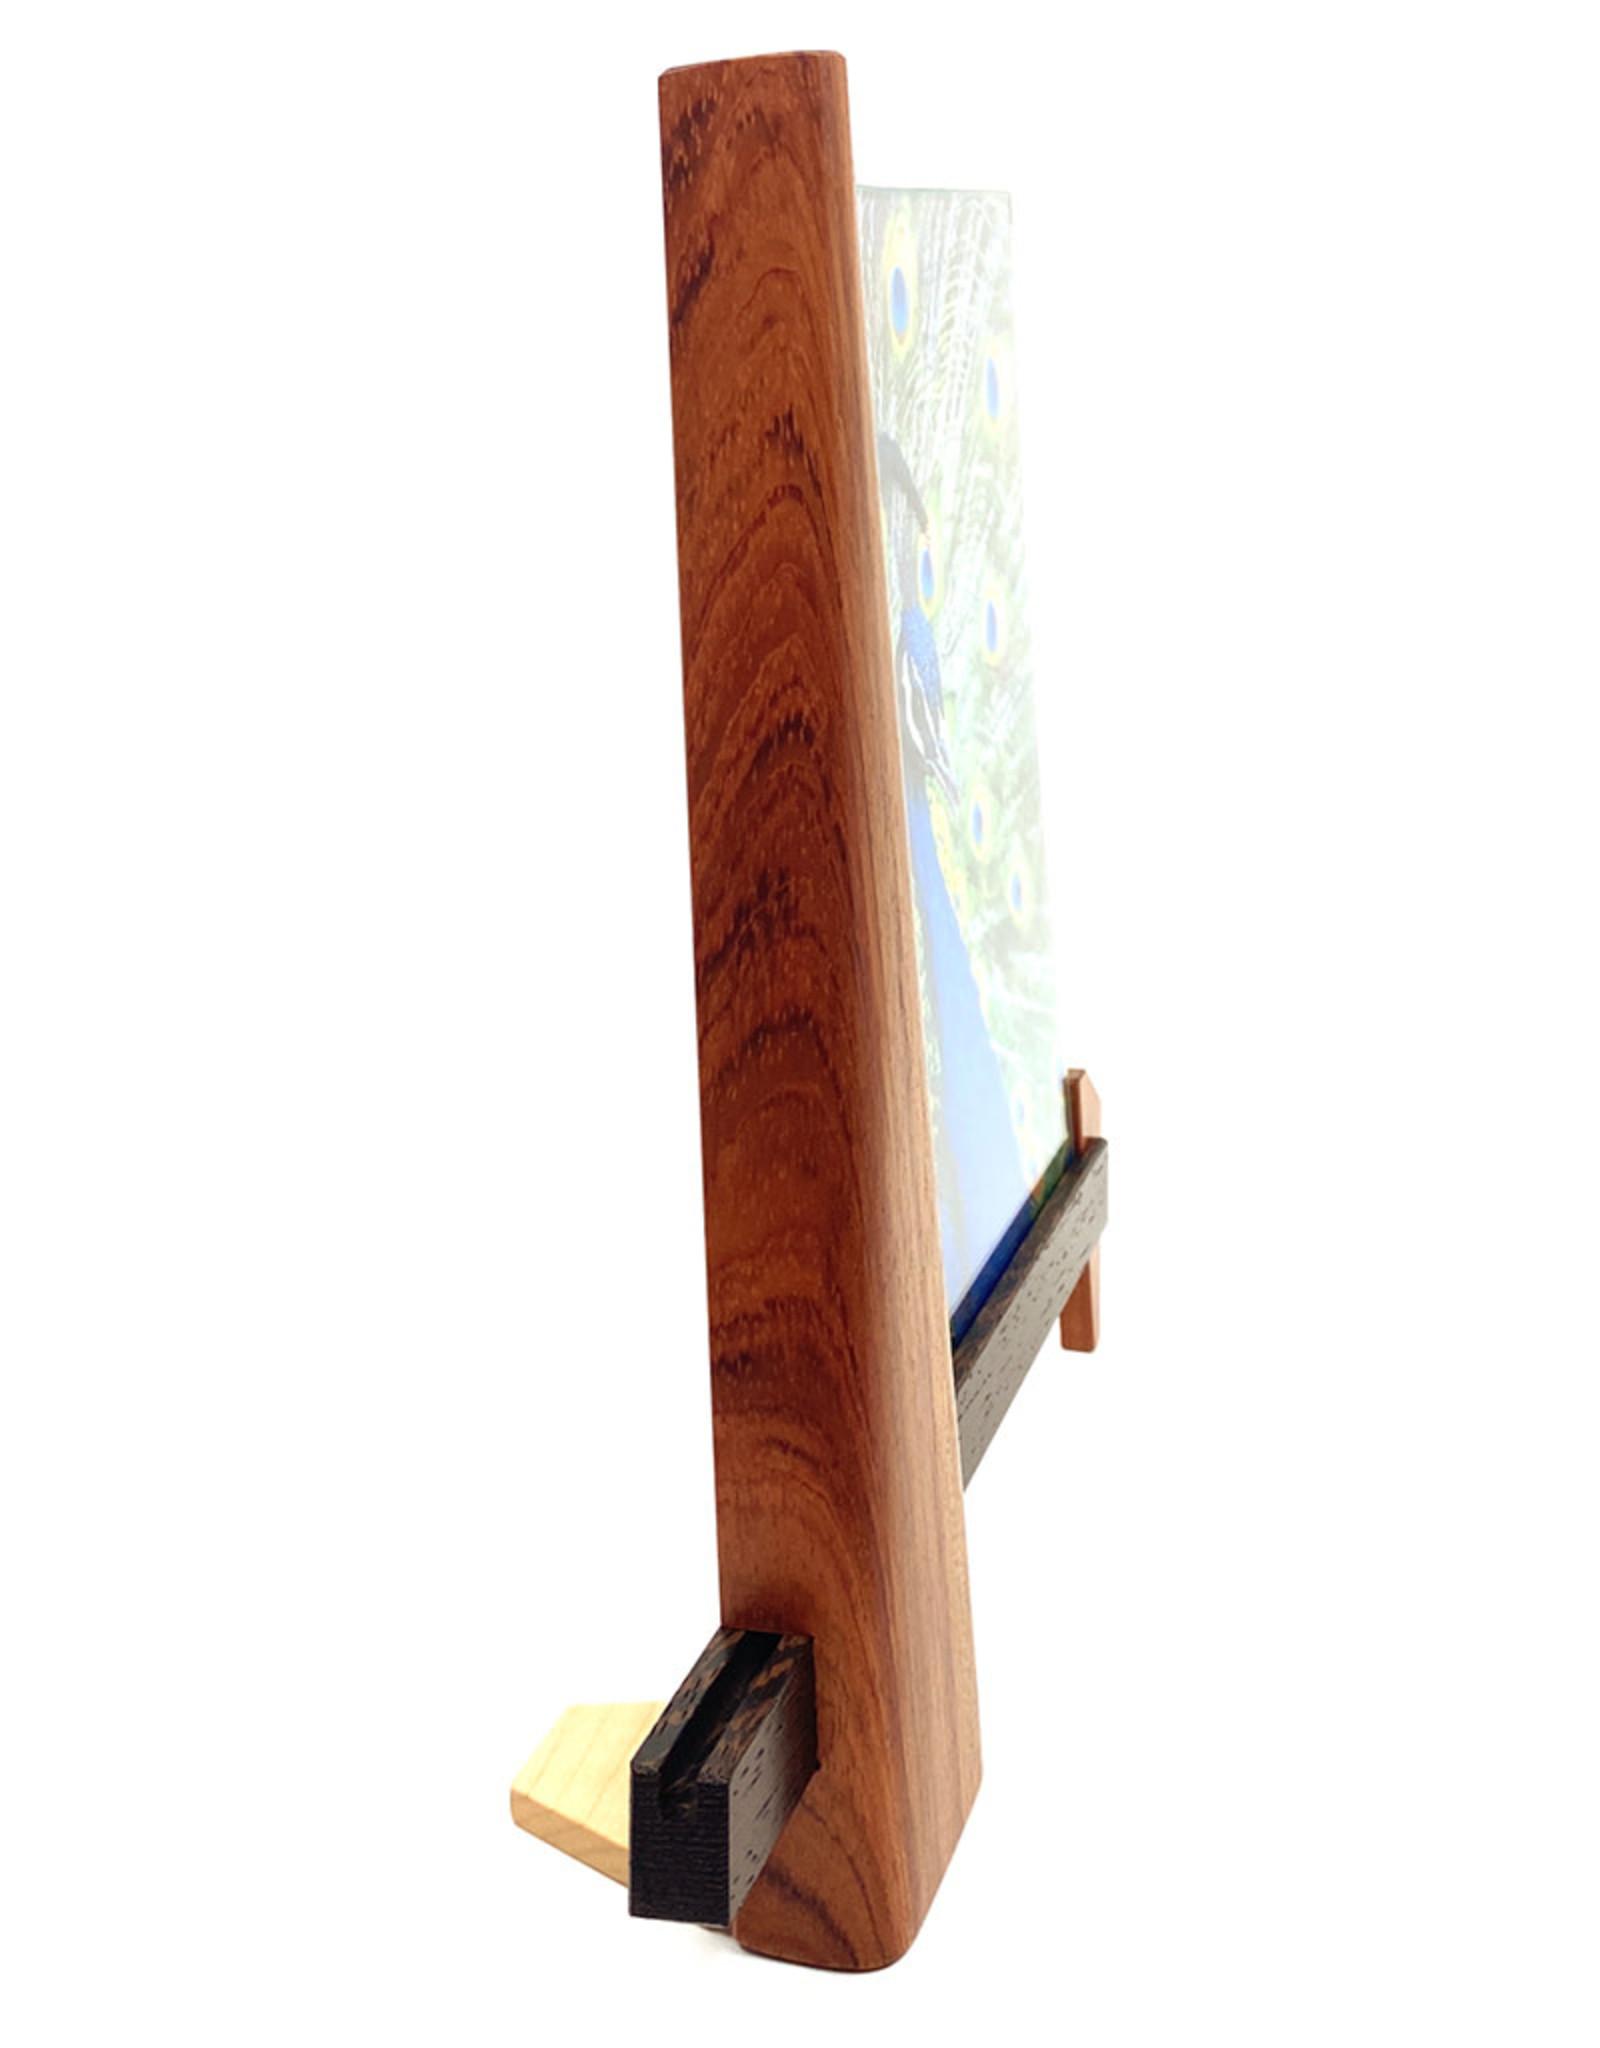 MIKUTOWSKI WOODWORKING VERTICAL BUBINGA VOYAGE PICTURE FRAME